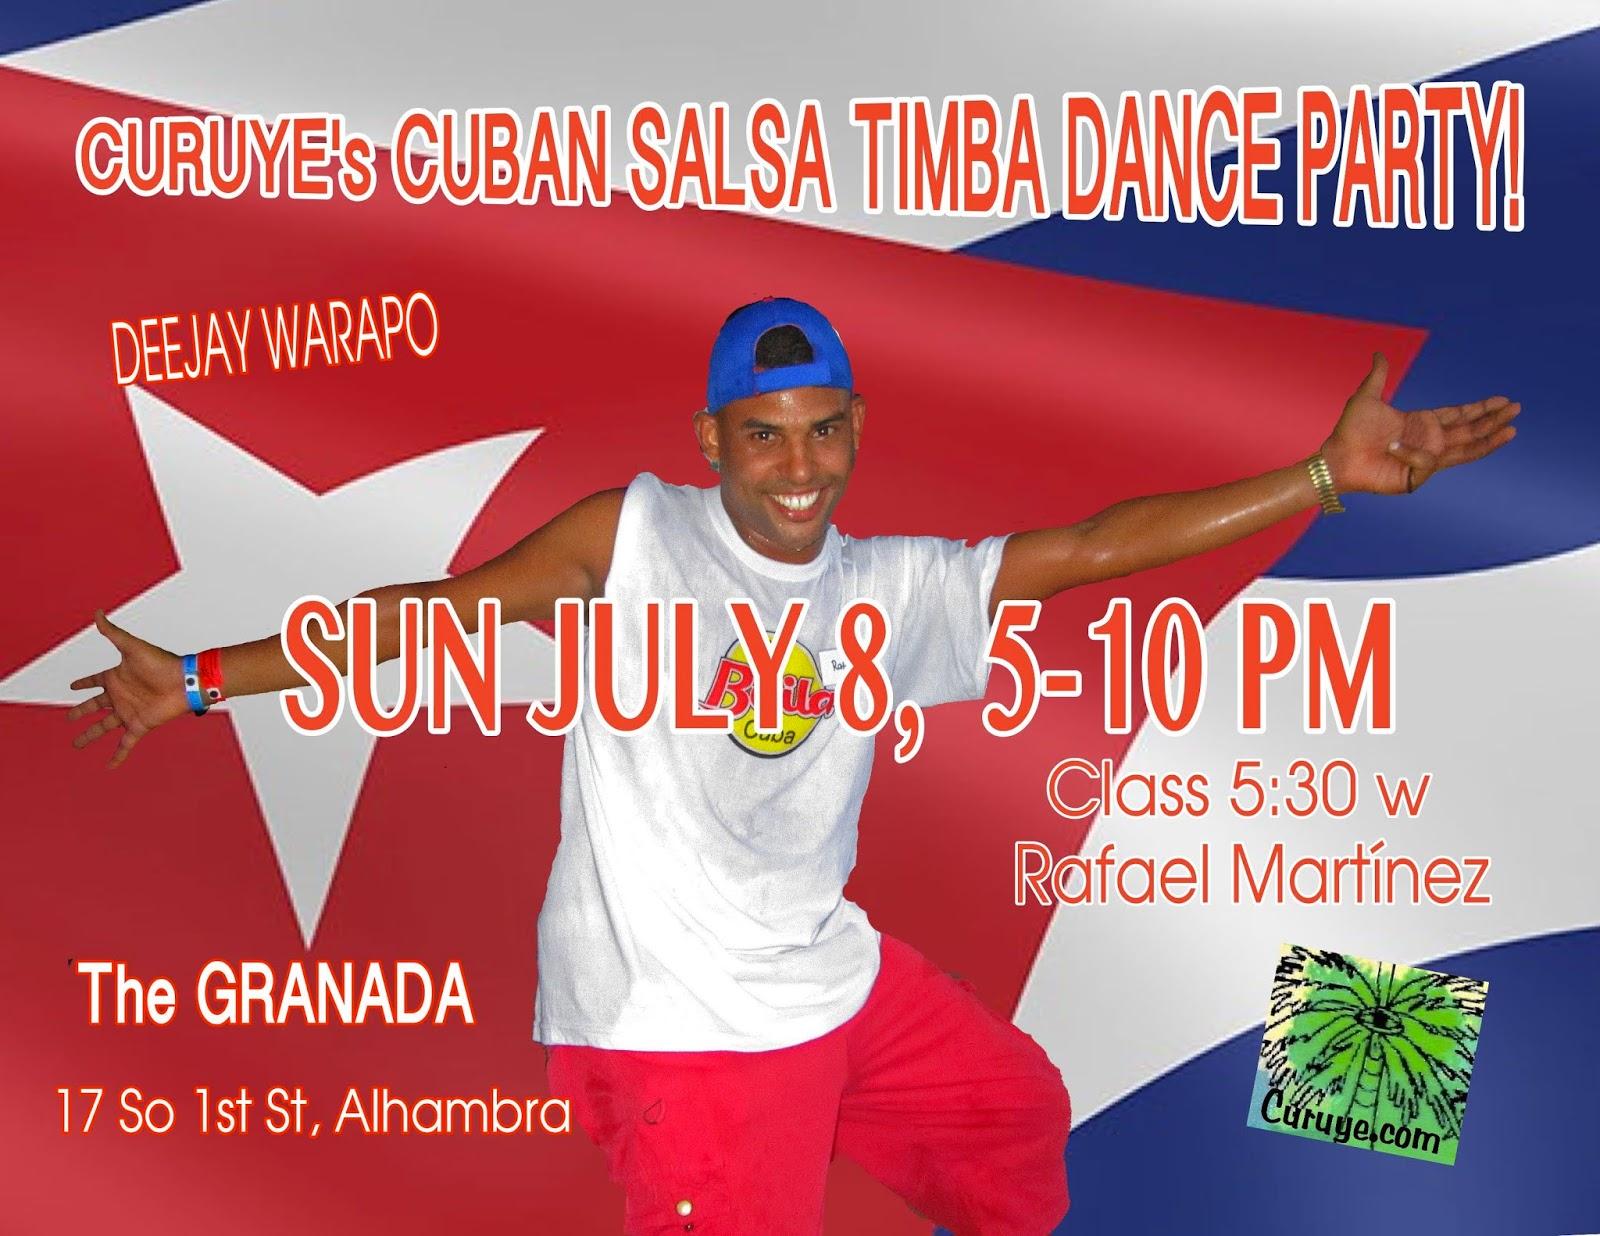 San Diego Rueda  CURUYE S JULY CUBAN SALSA TIMBA DANCE PARTY w ... 695ff98ddee